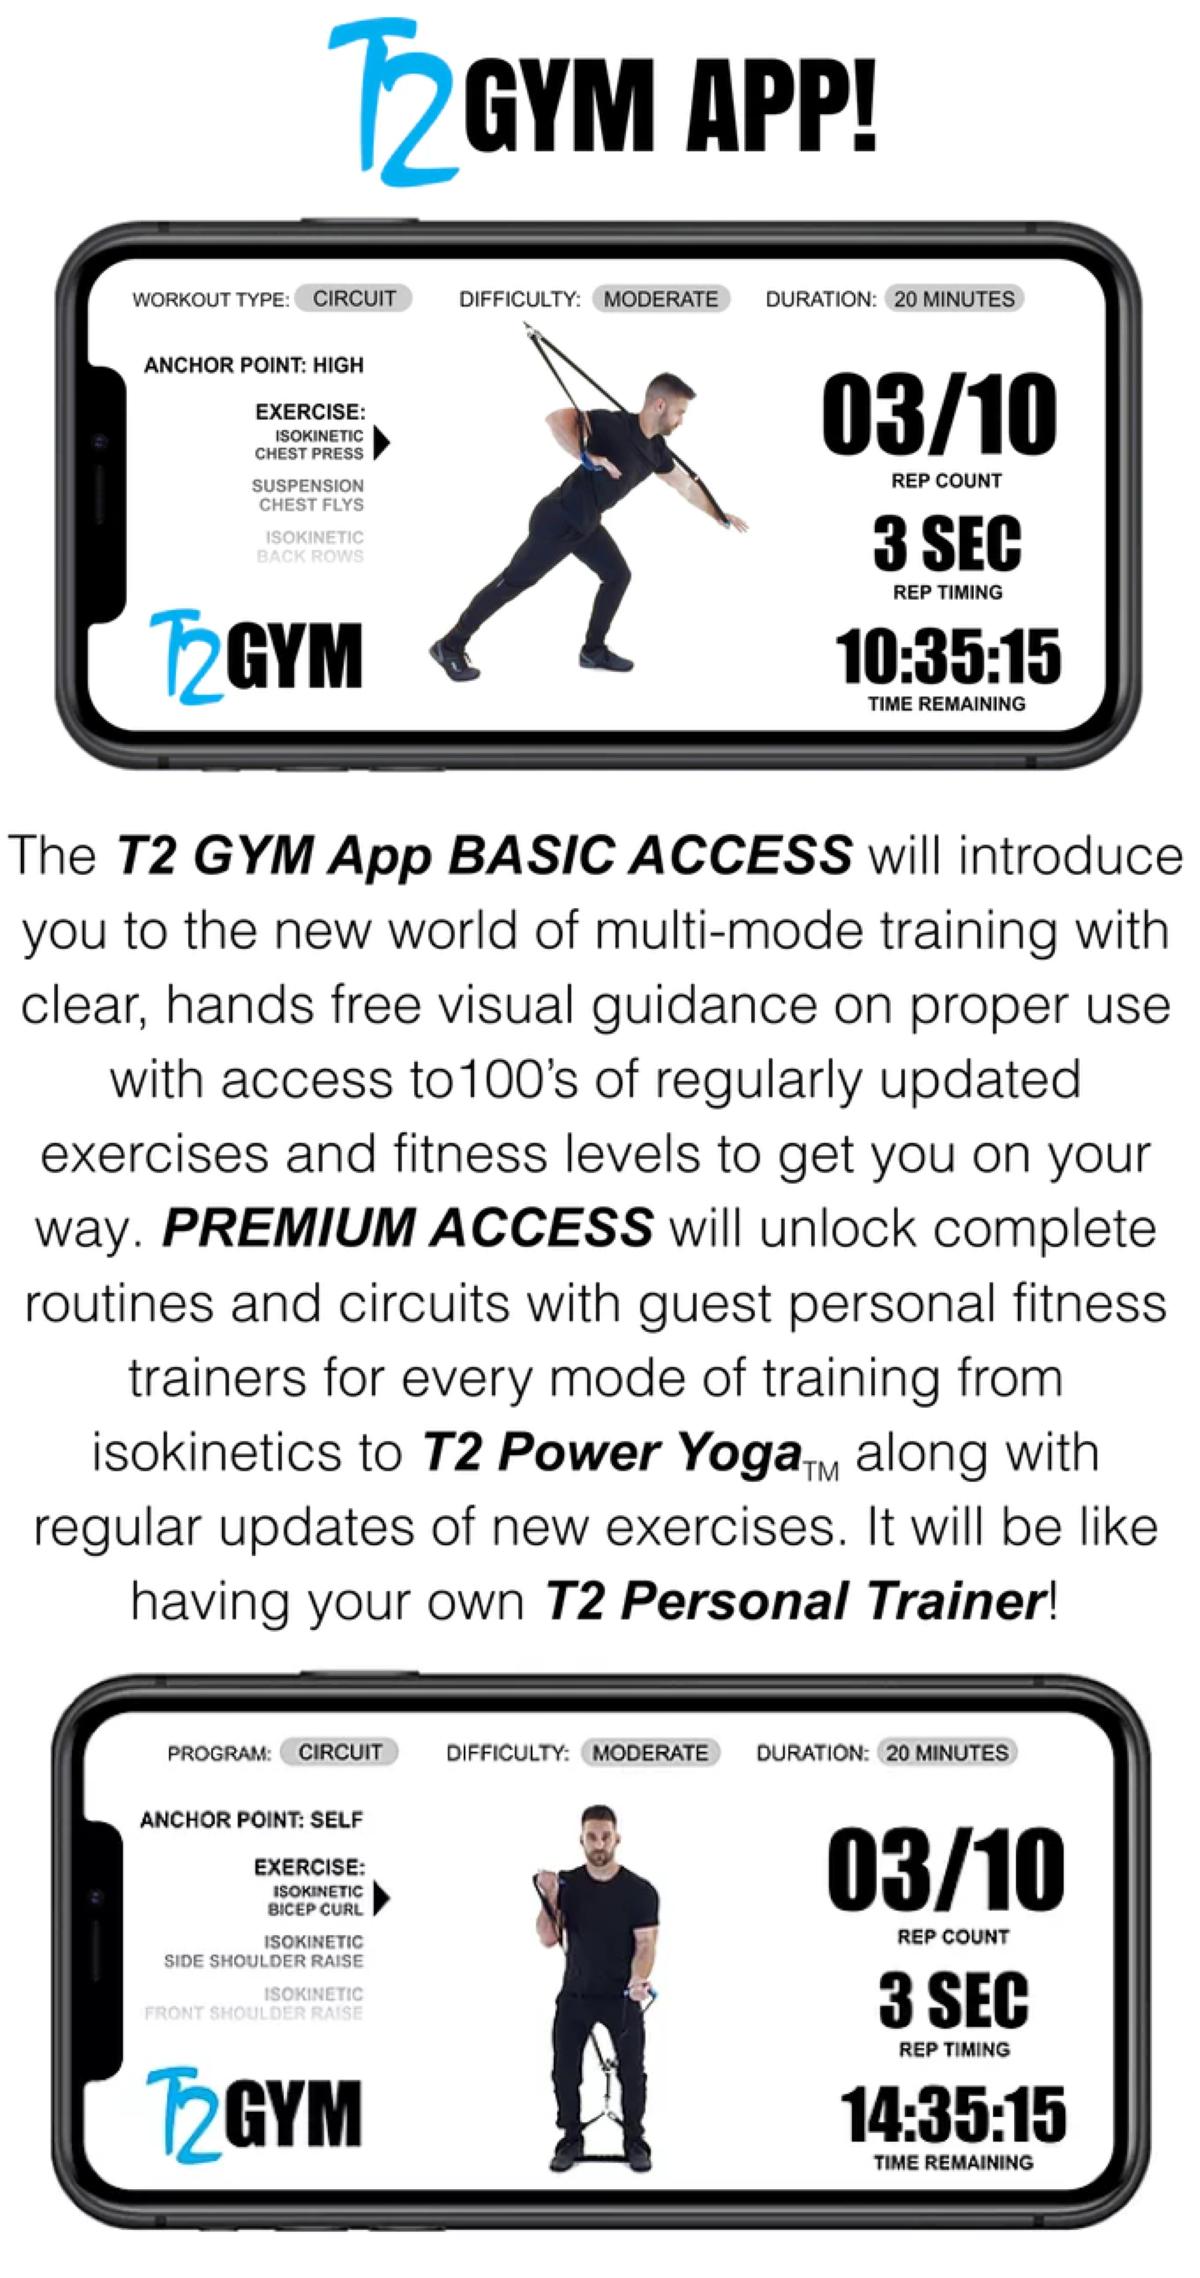 T2 Gym App